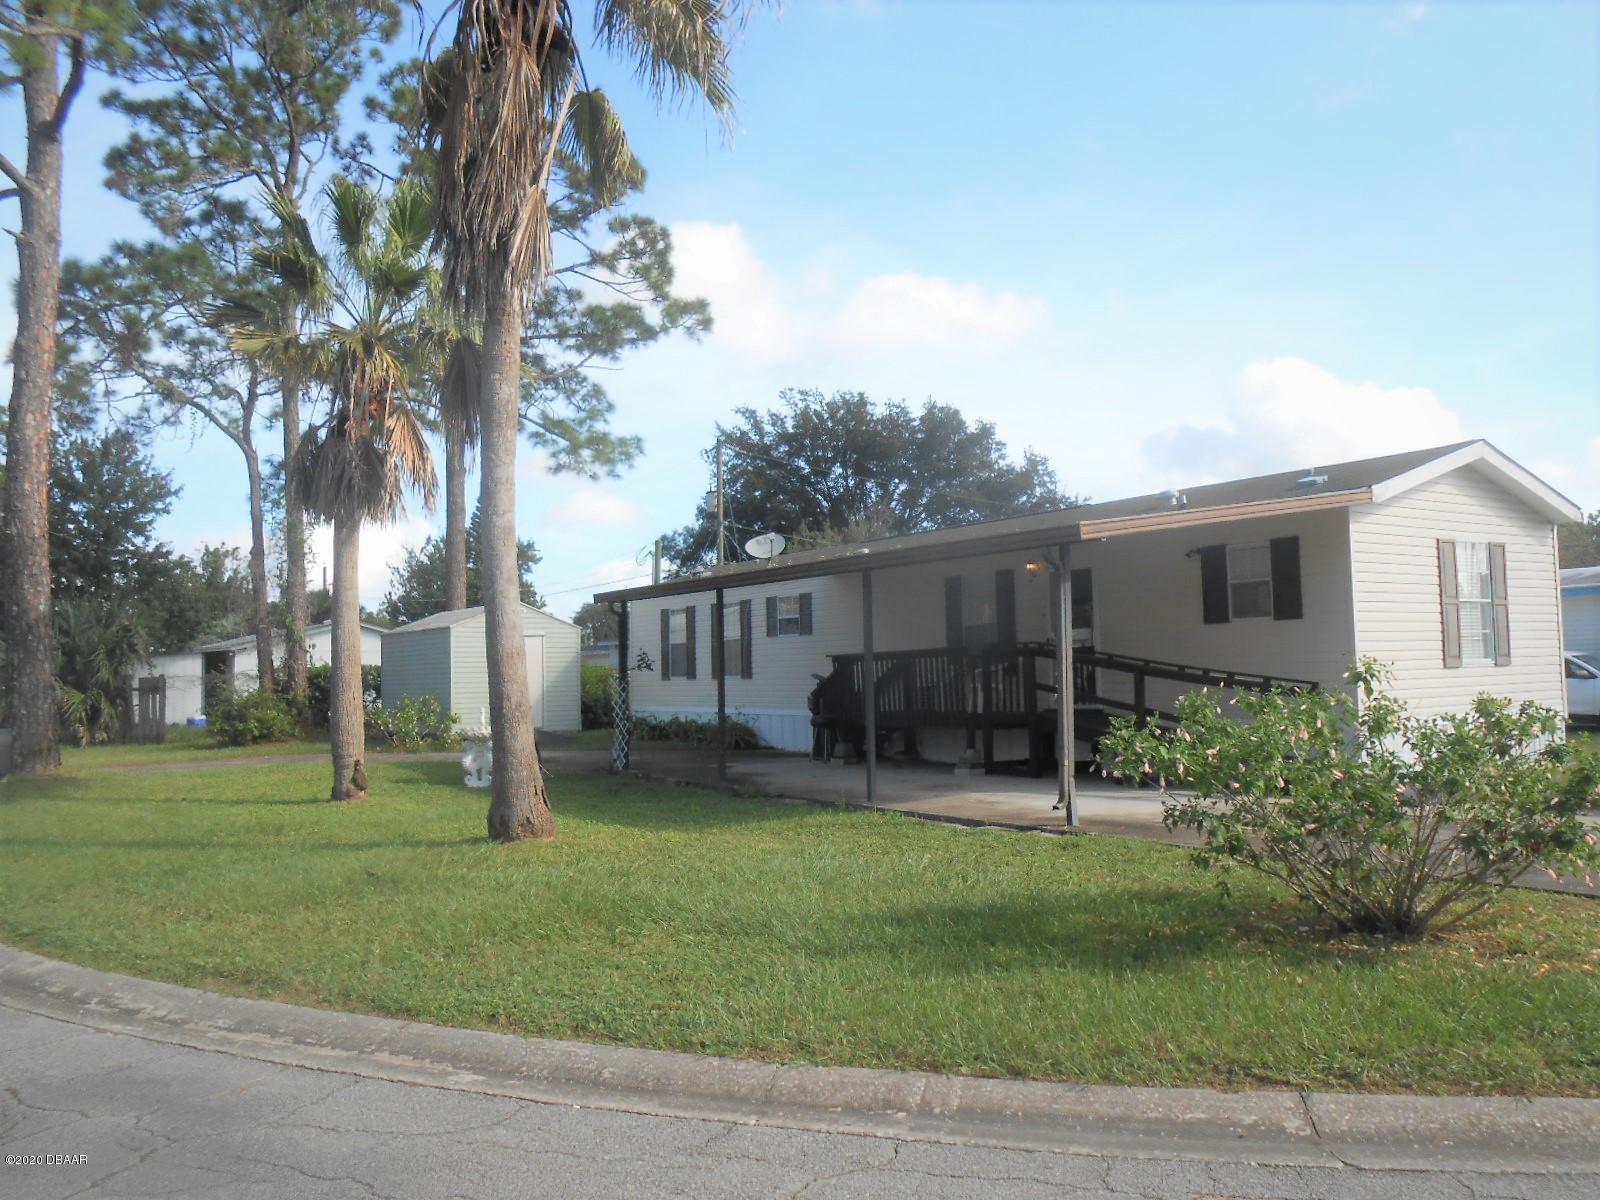 Photo of 1805 Sunny Palm Drive, Ormond Beach, FL 32174